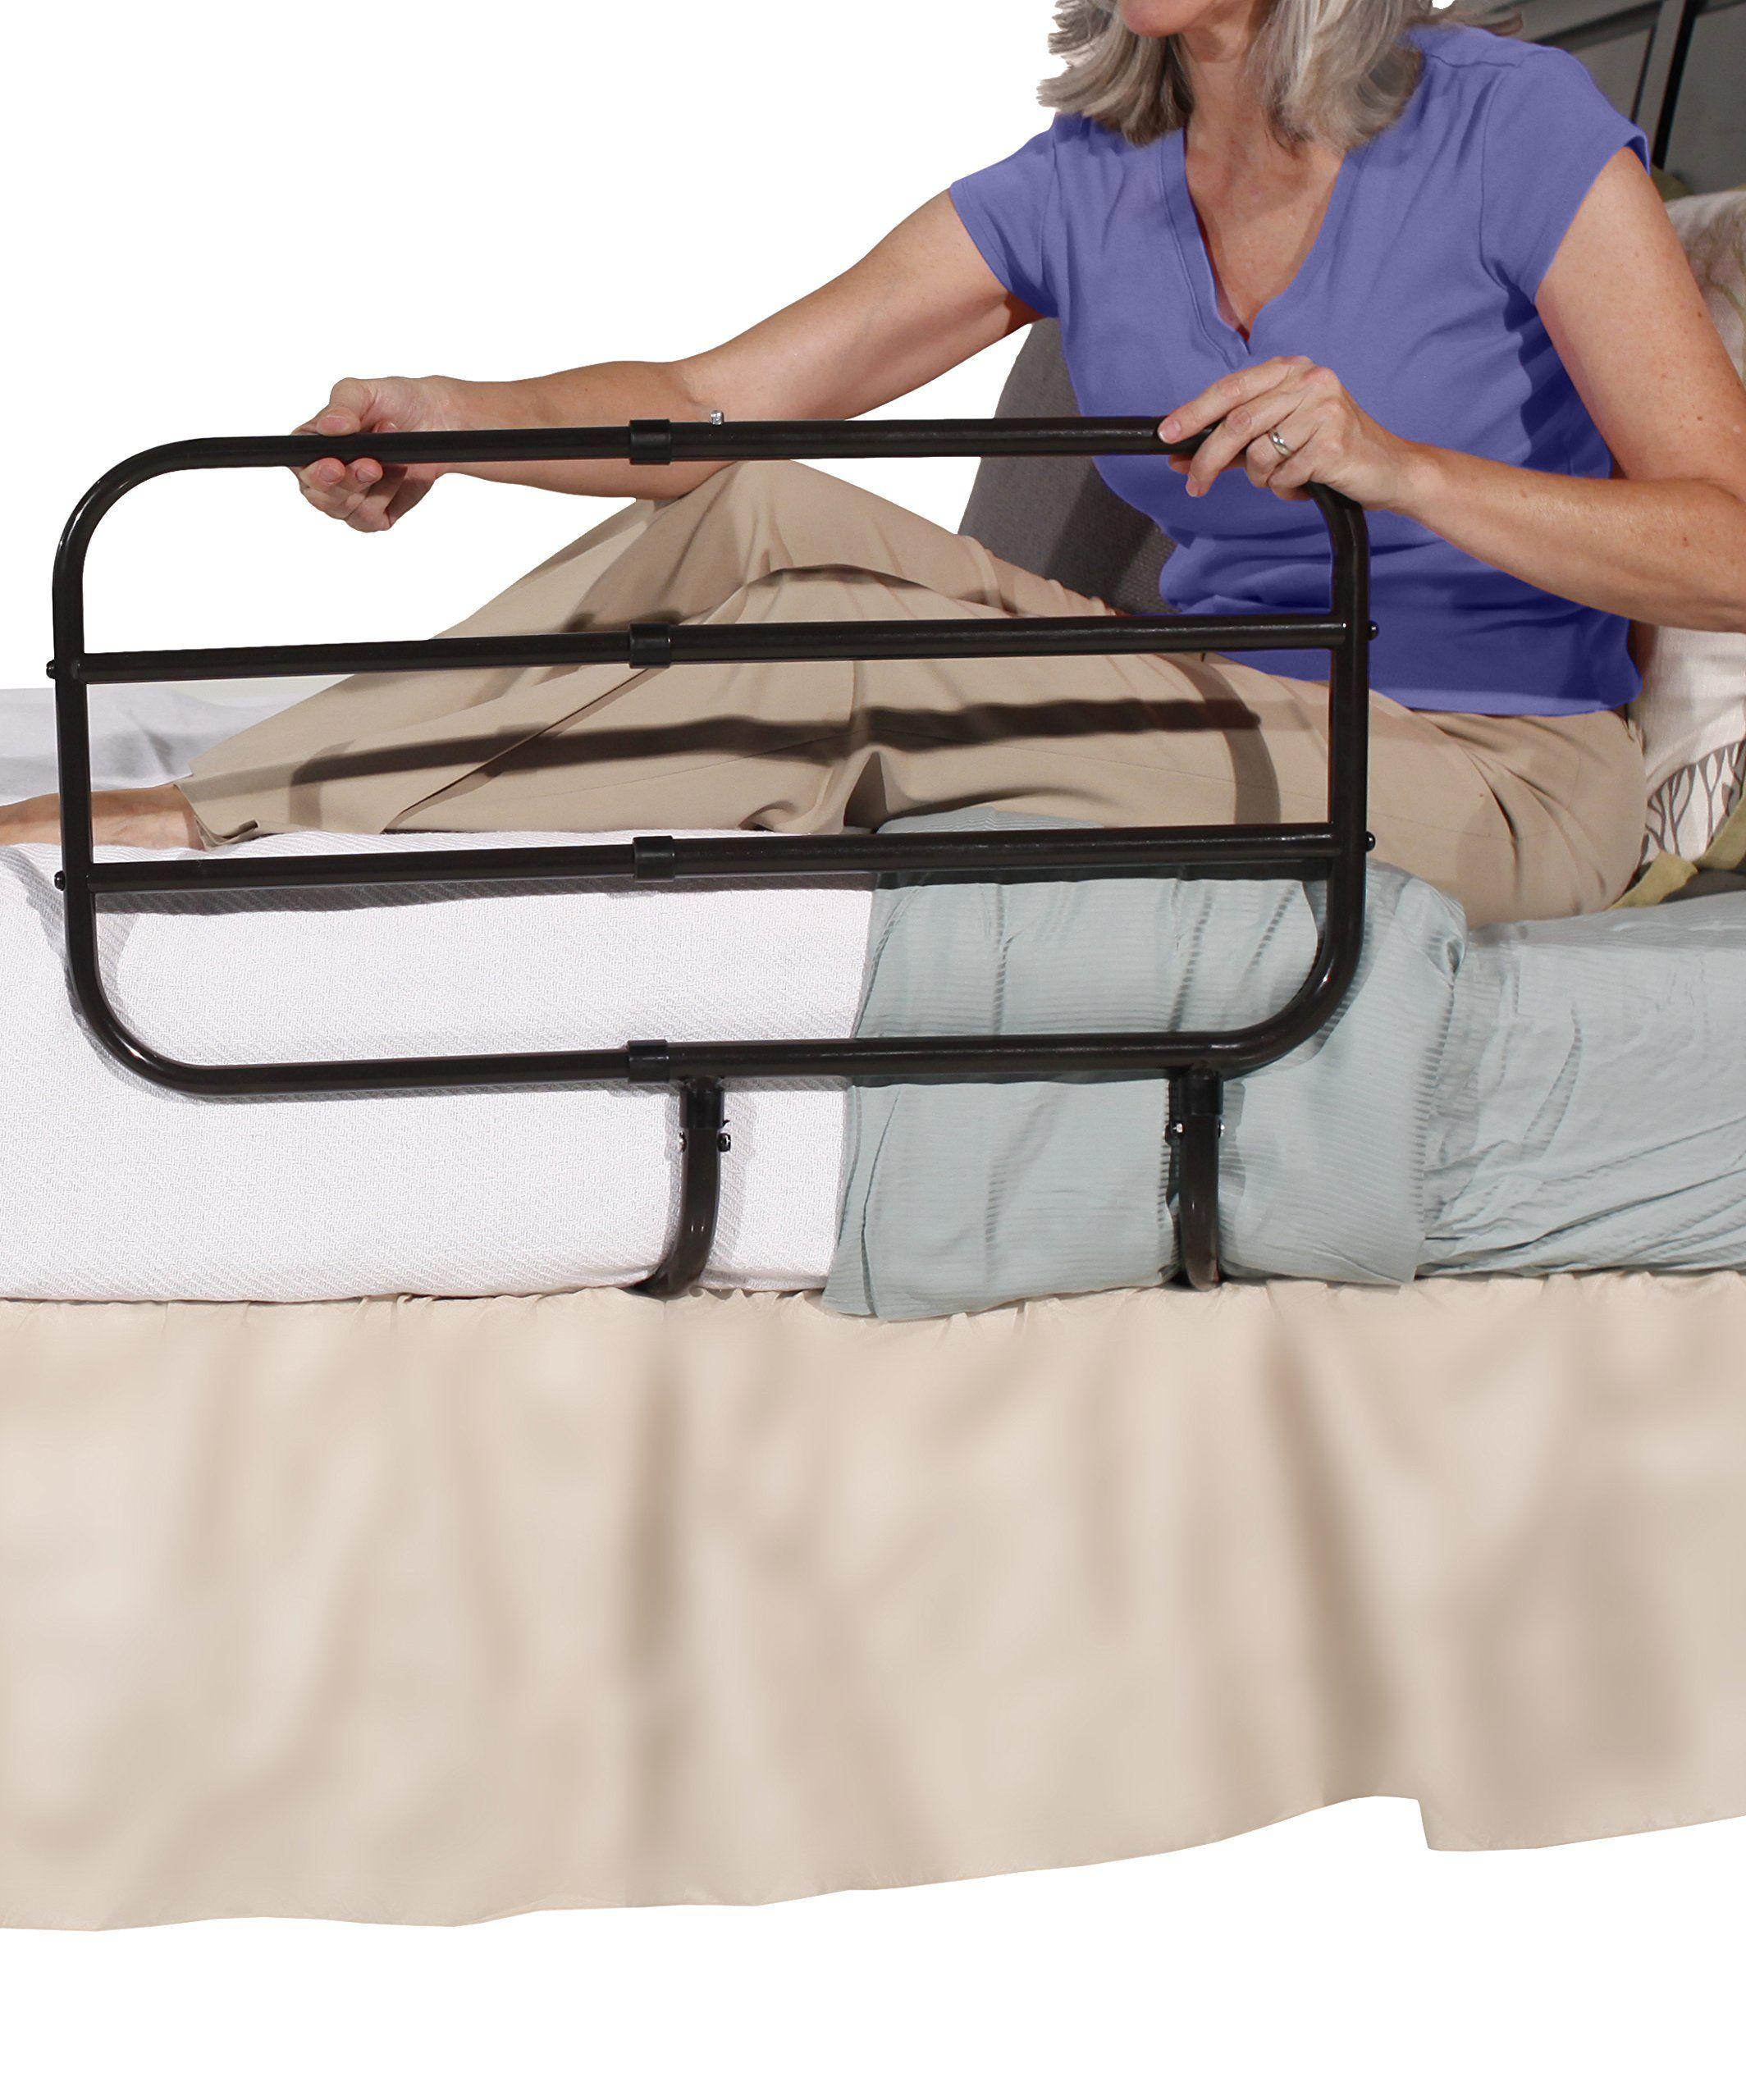 safety com medline hospital medokare amazon bed dp adjustable installation for easy frame with adults rails height grade toilet elderly